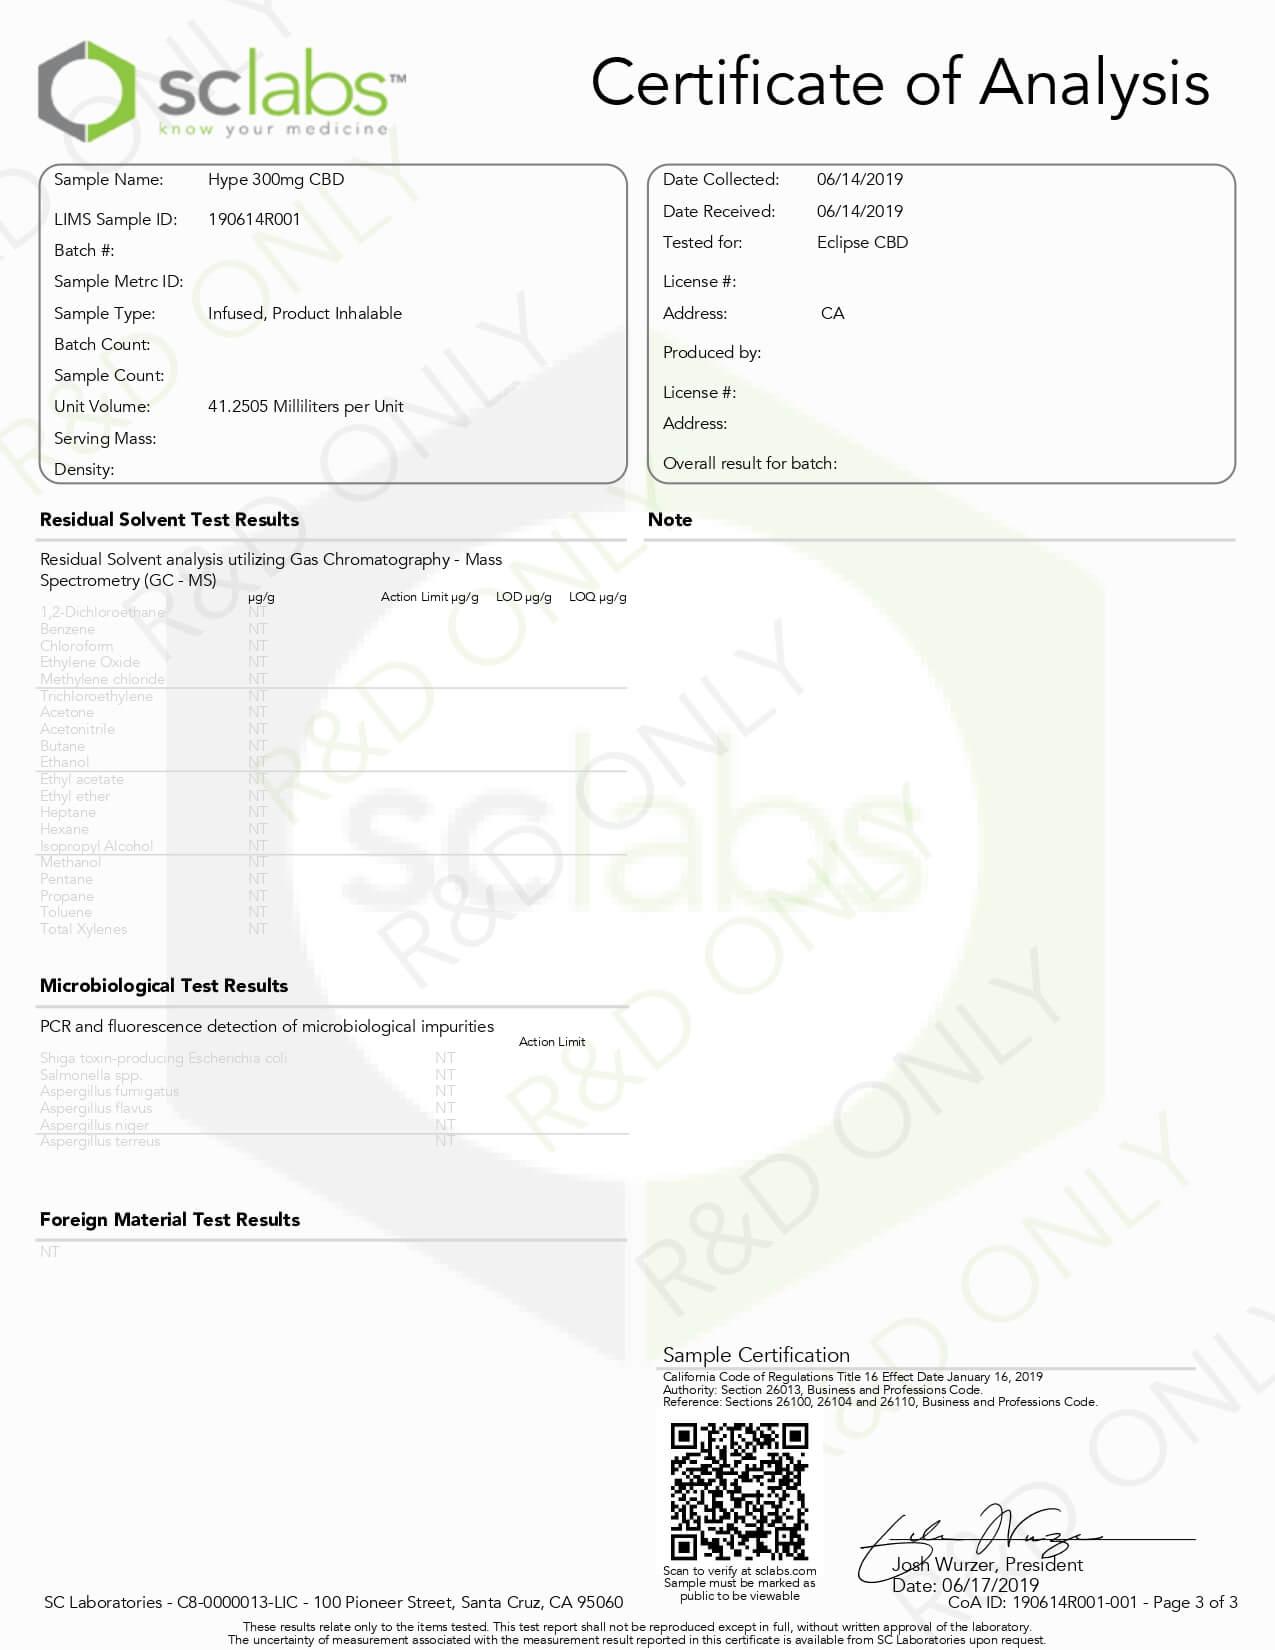 Eclipse CBD Vape Juice Hype 300mg Lab Report